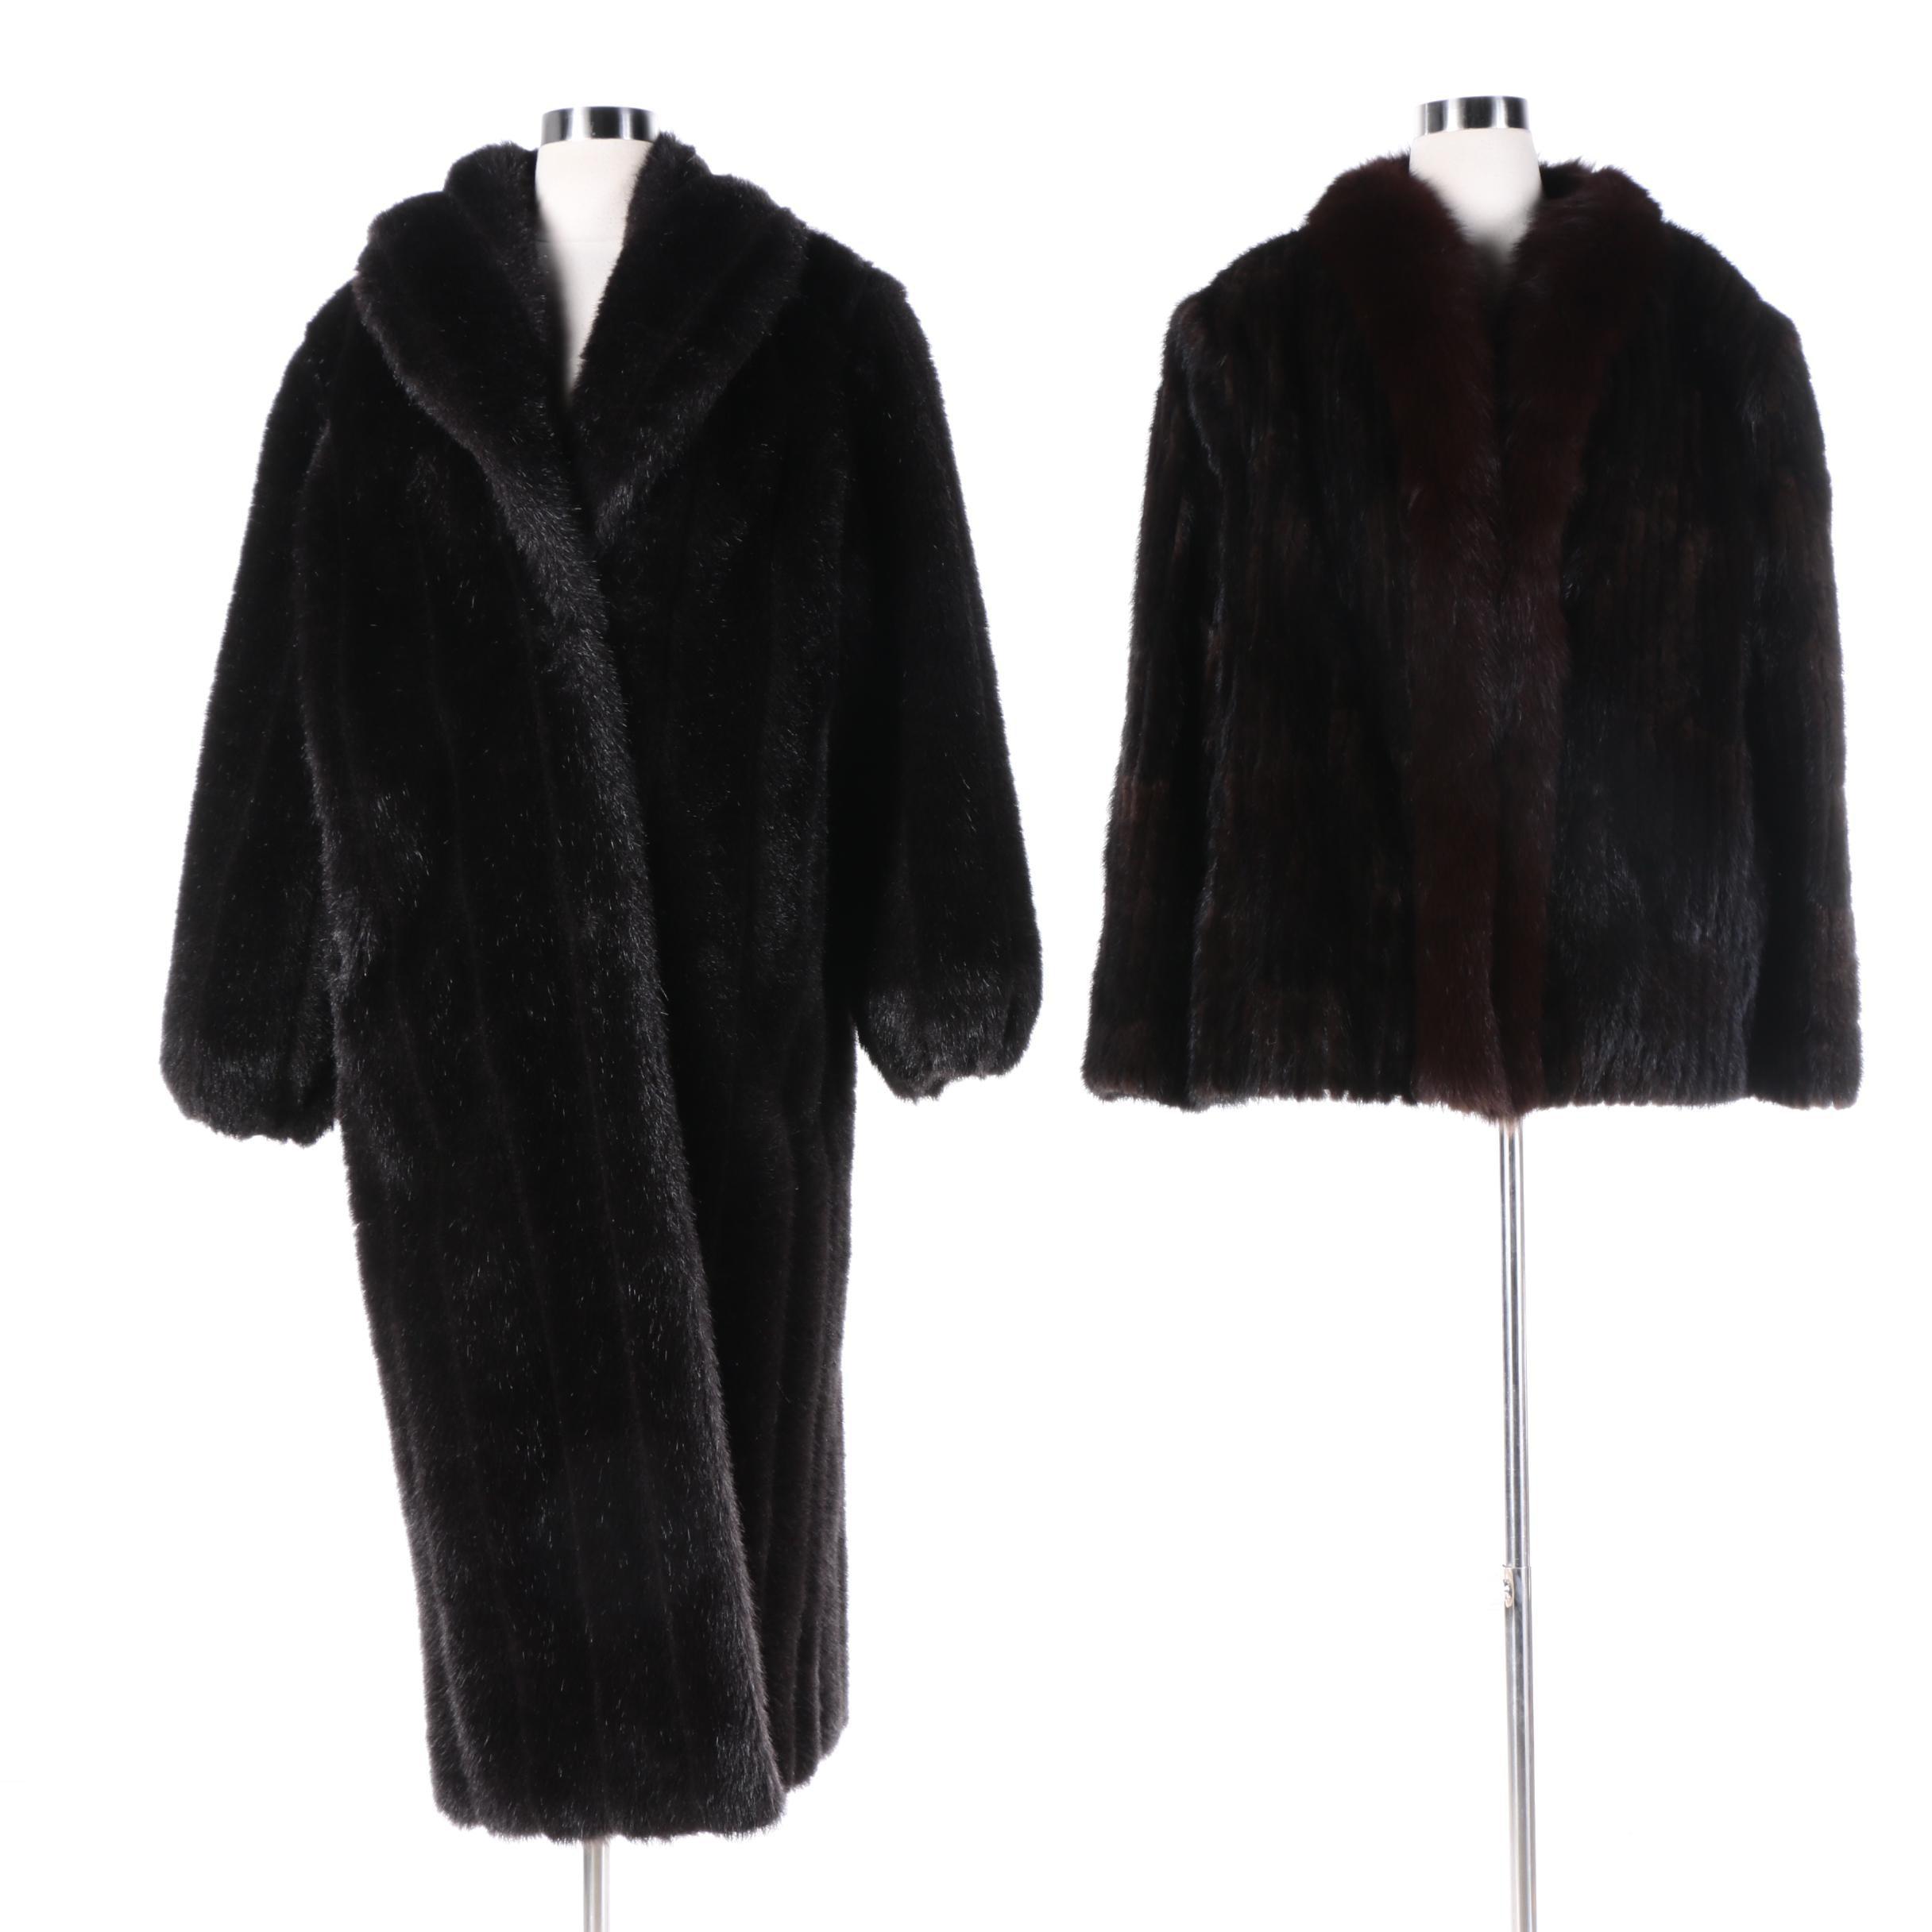 Saga Mink Fur Jacket and Monterey Fashions Faux Fur Coat